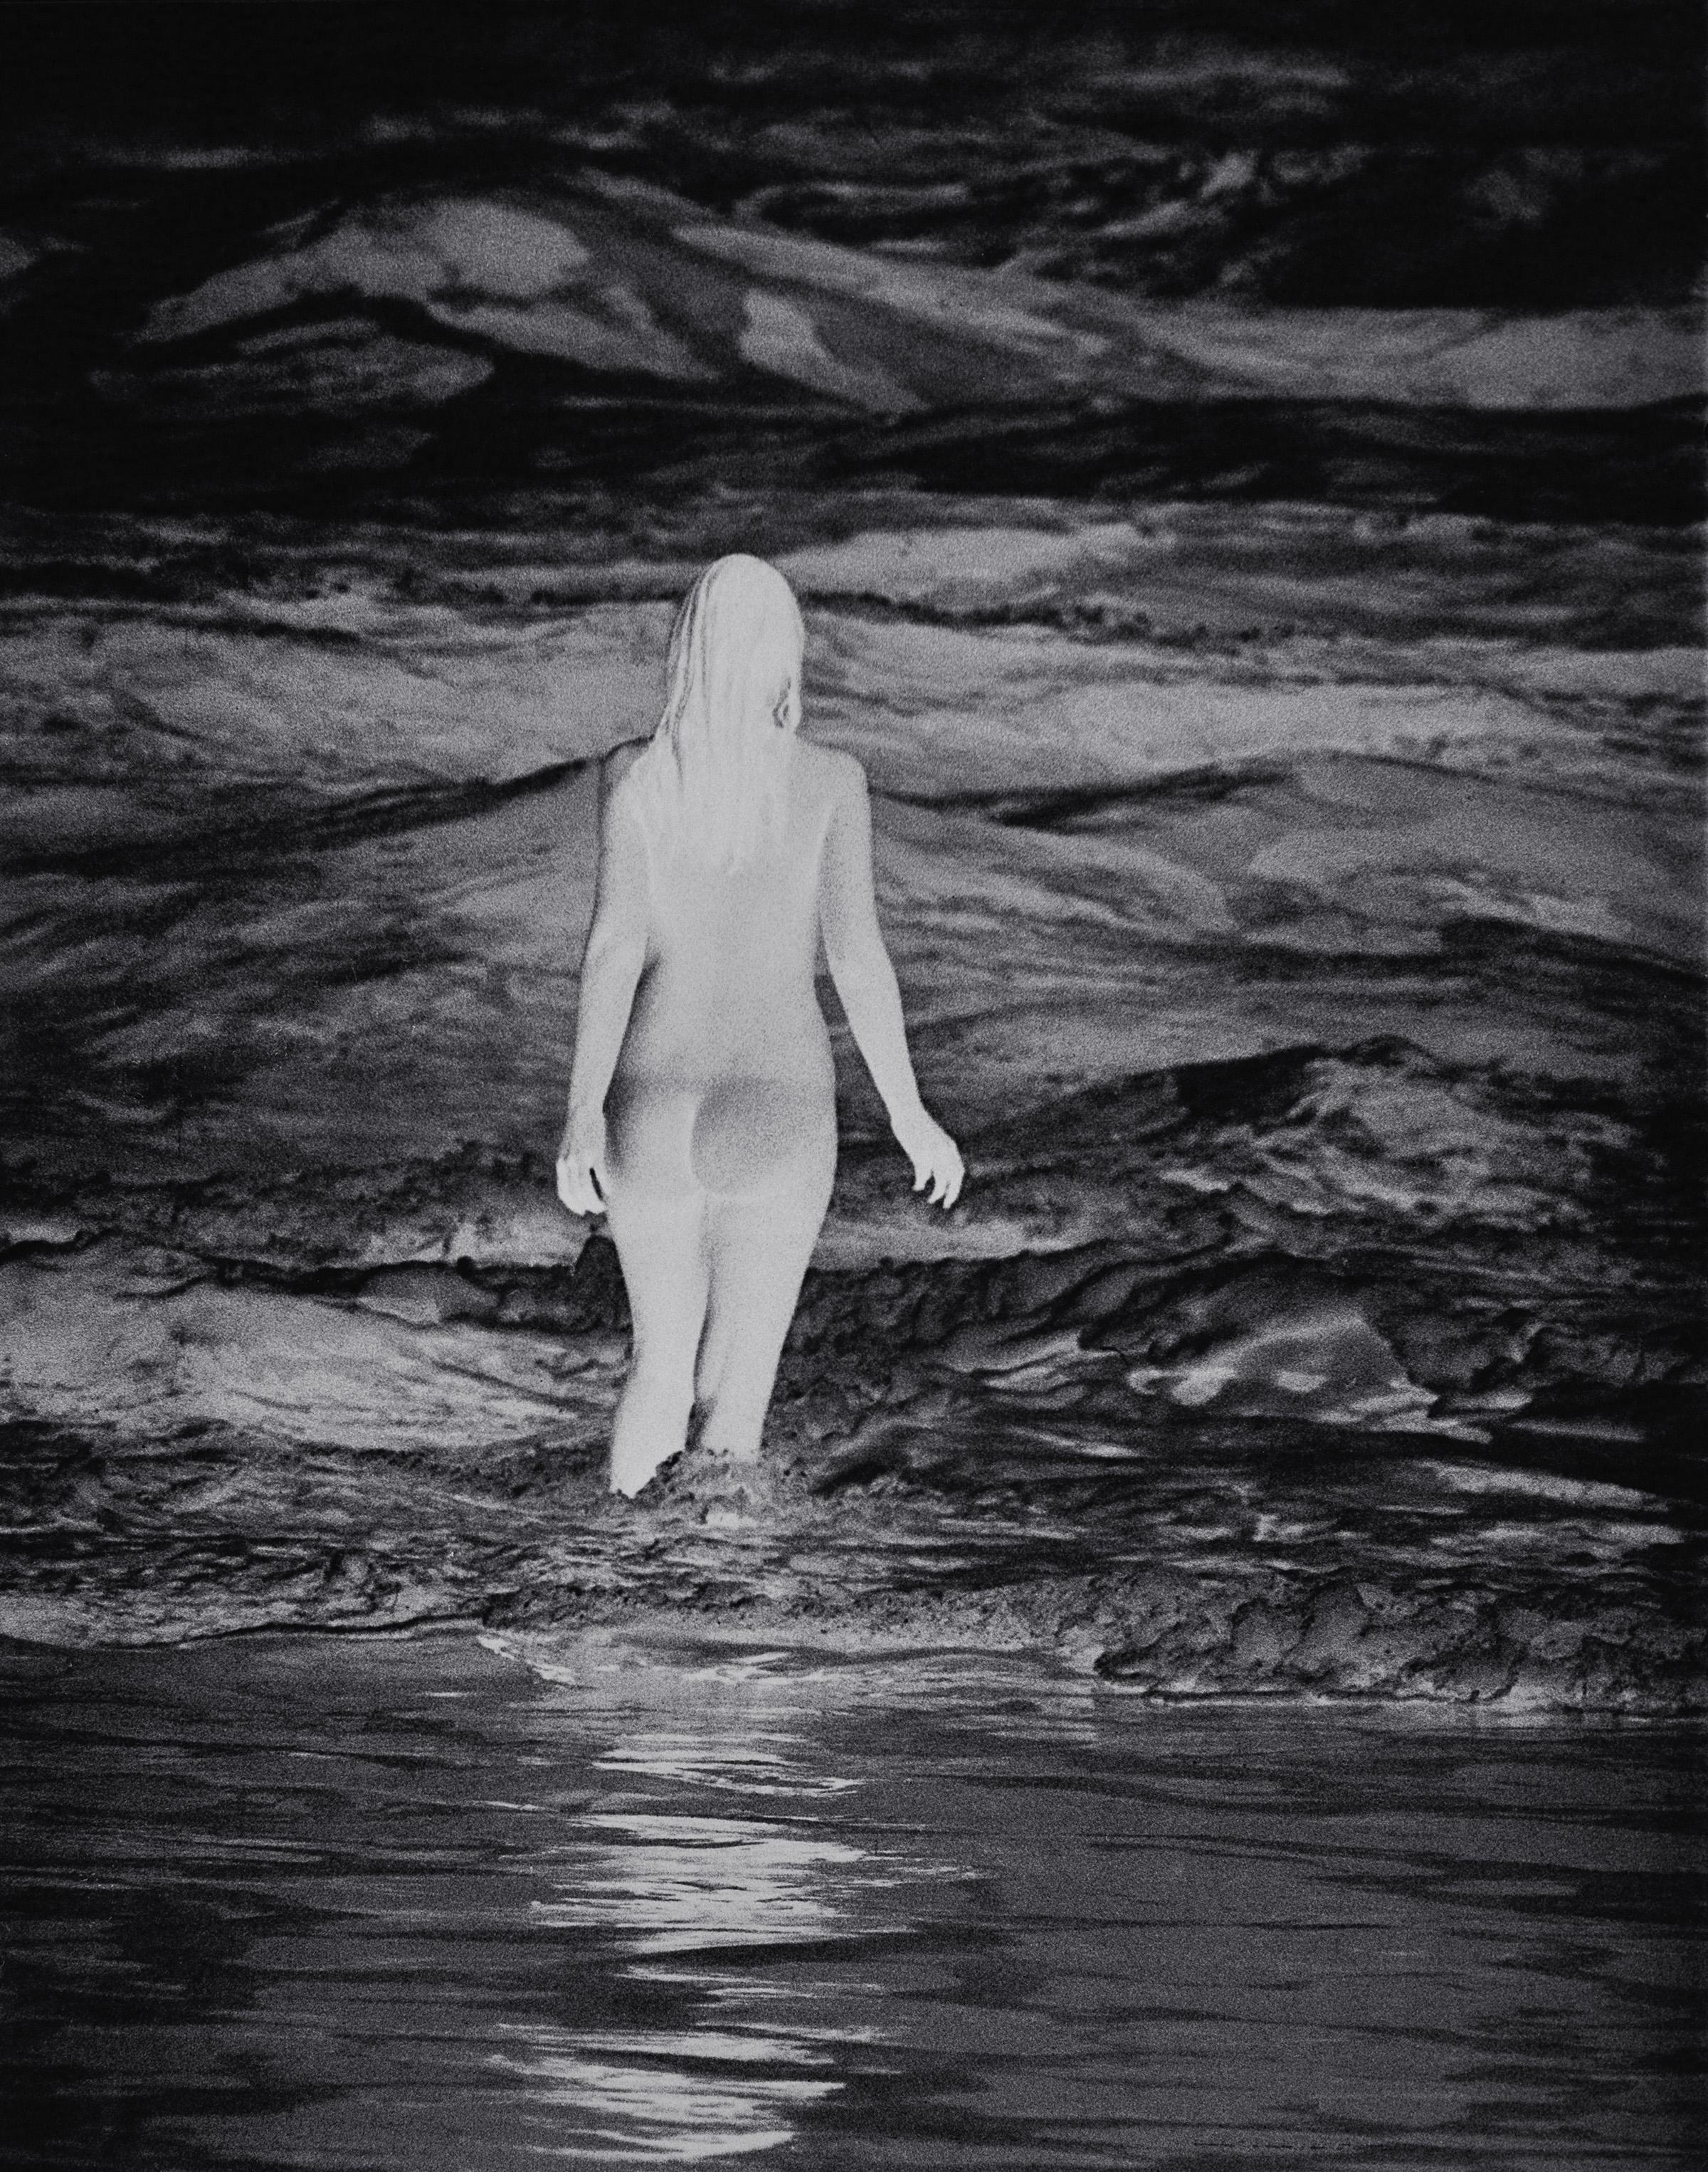 Anne Collier, Negative (California), 2013 © Anne Collier; Courtesy of the artist; Anton Kern Gallery, New York; Galerie Neu, Berlin; and The Modern Institute/Toby Webster Ltd., Glasgow